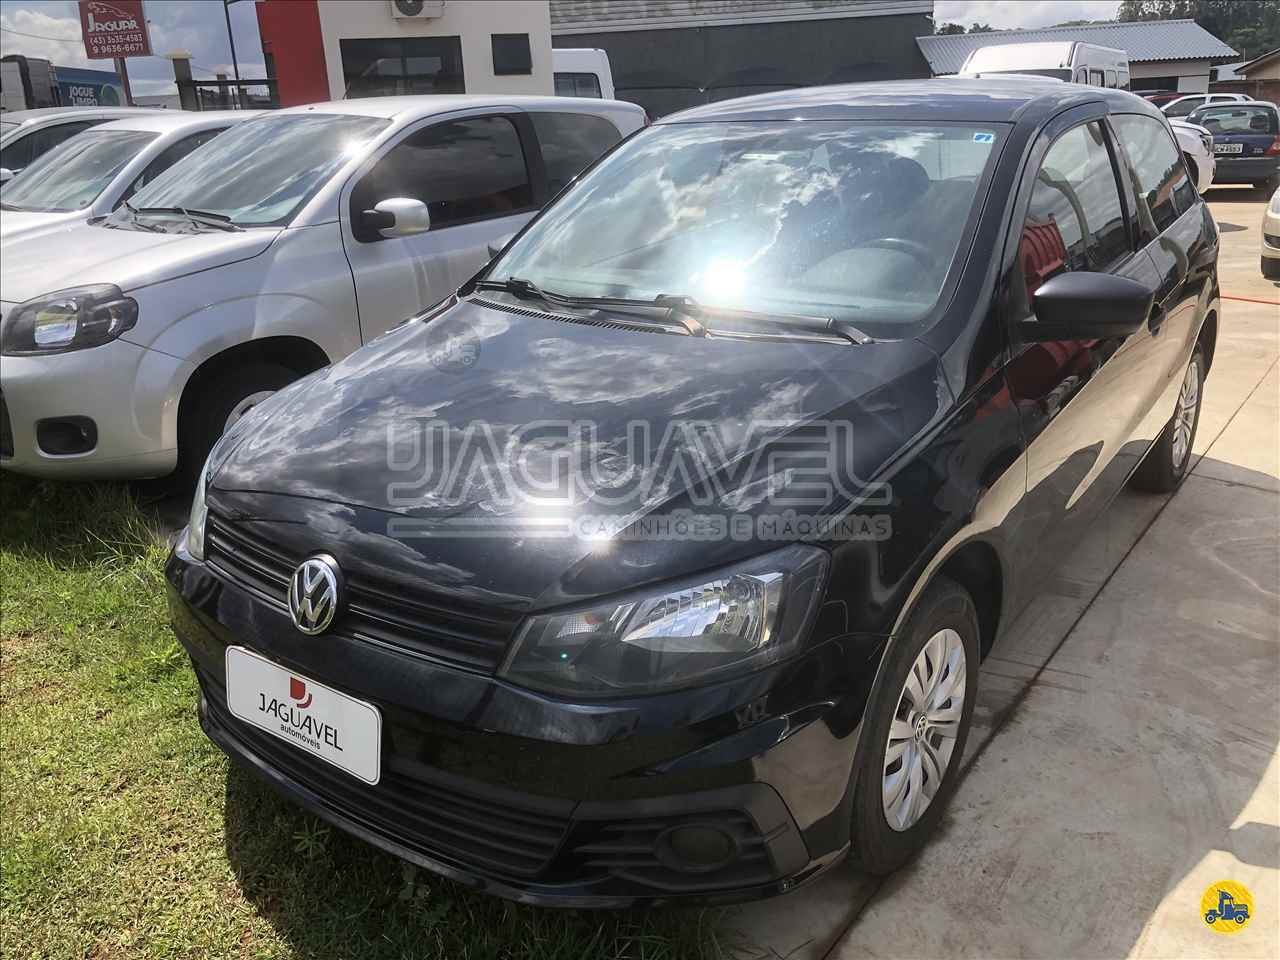 CARRO VW - Volkswagen Gol 1.0 Trendline Jaguavel Caminhões JAGUARIAIVA PARANÁ PR